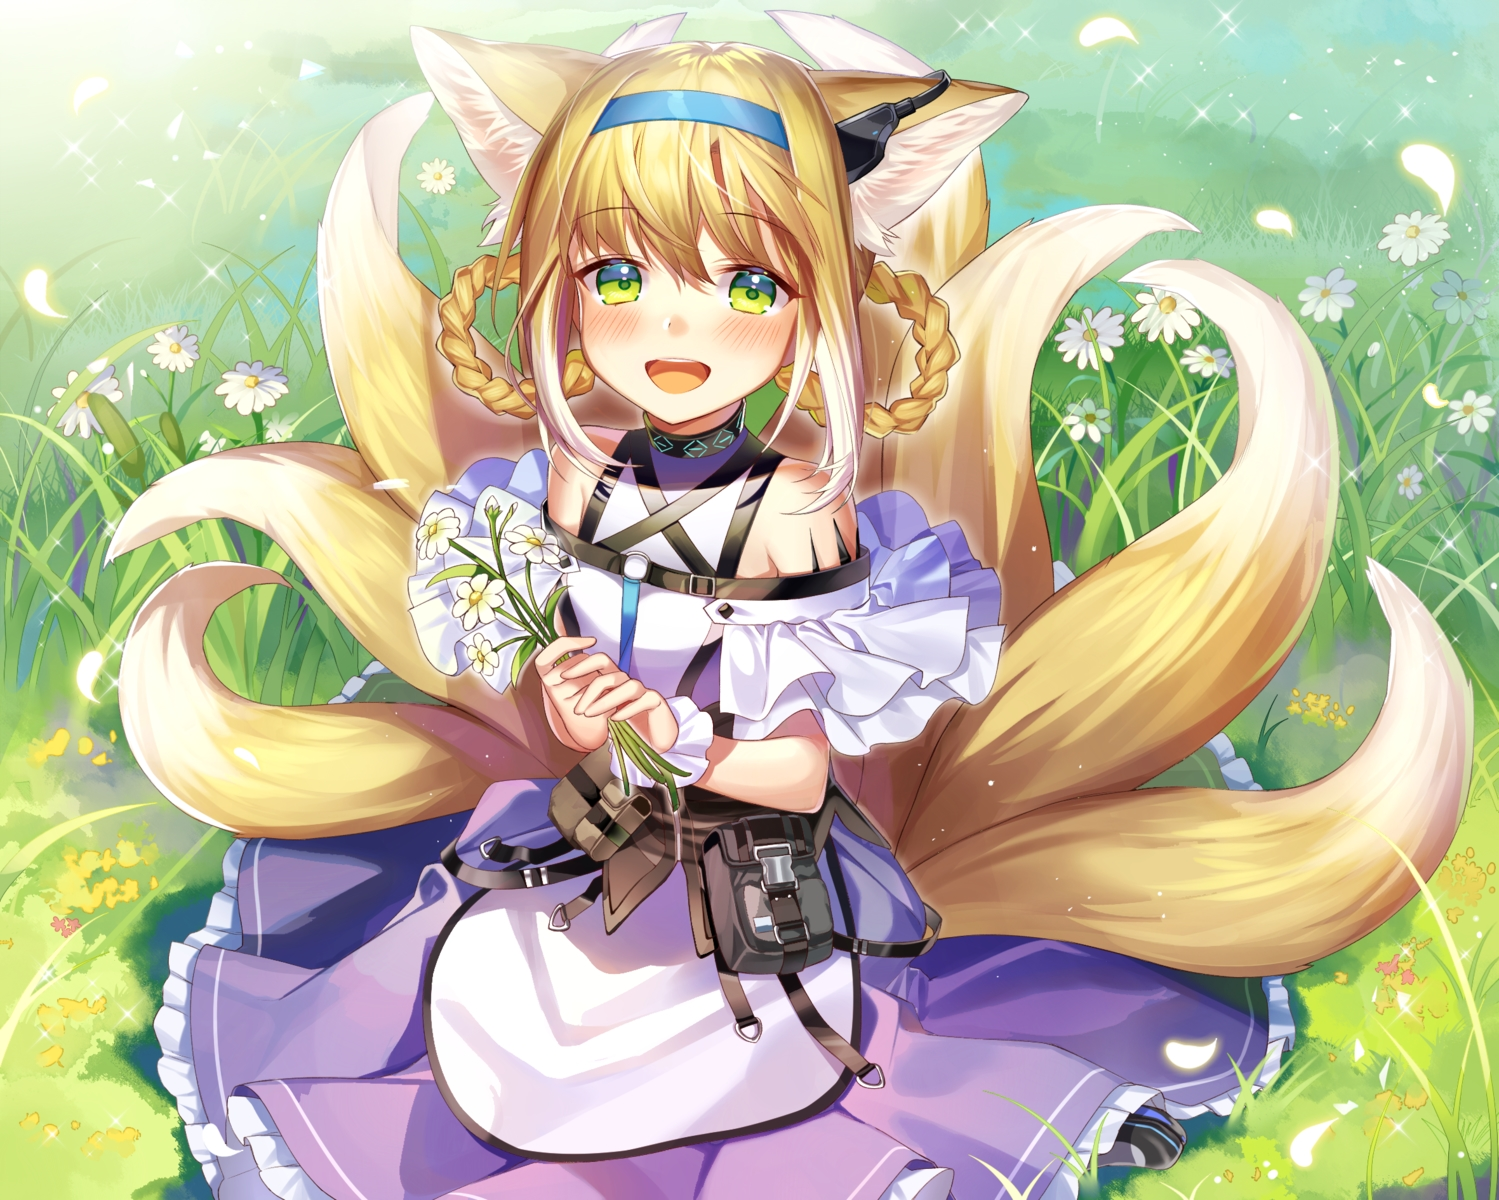 animal_ears arknights blonde_hair blush braids dress flat_chest flowers foxgirl grass green_eyes headband ion_(on01e) multiple_tails suzuran_(arknights) tail wristwear